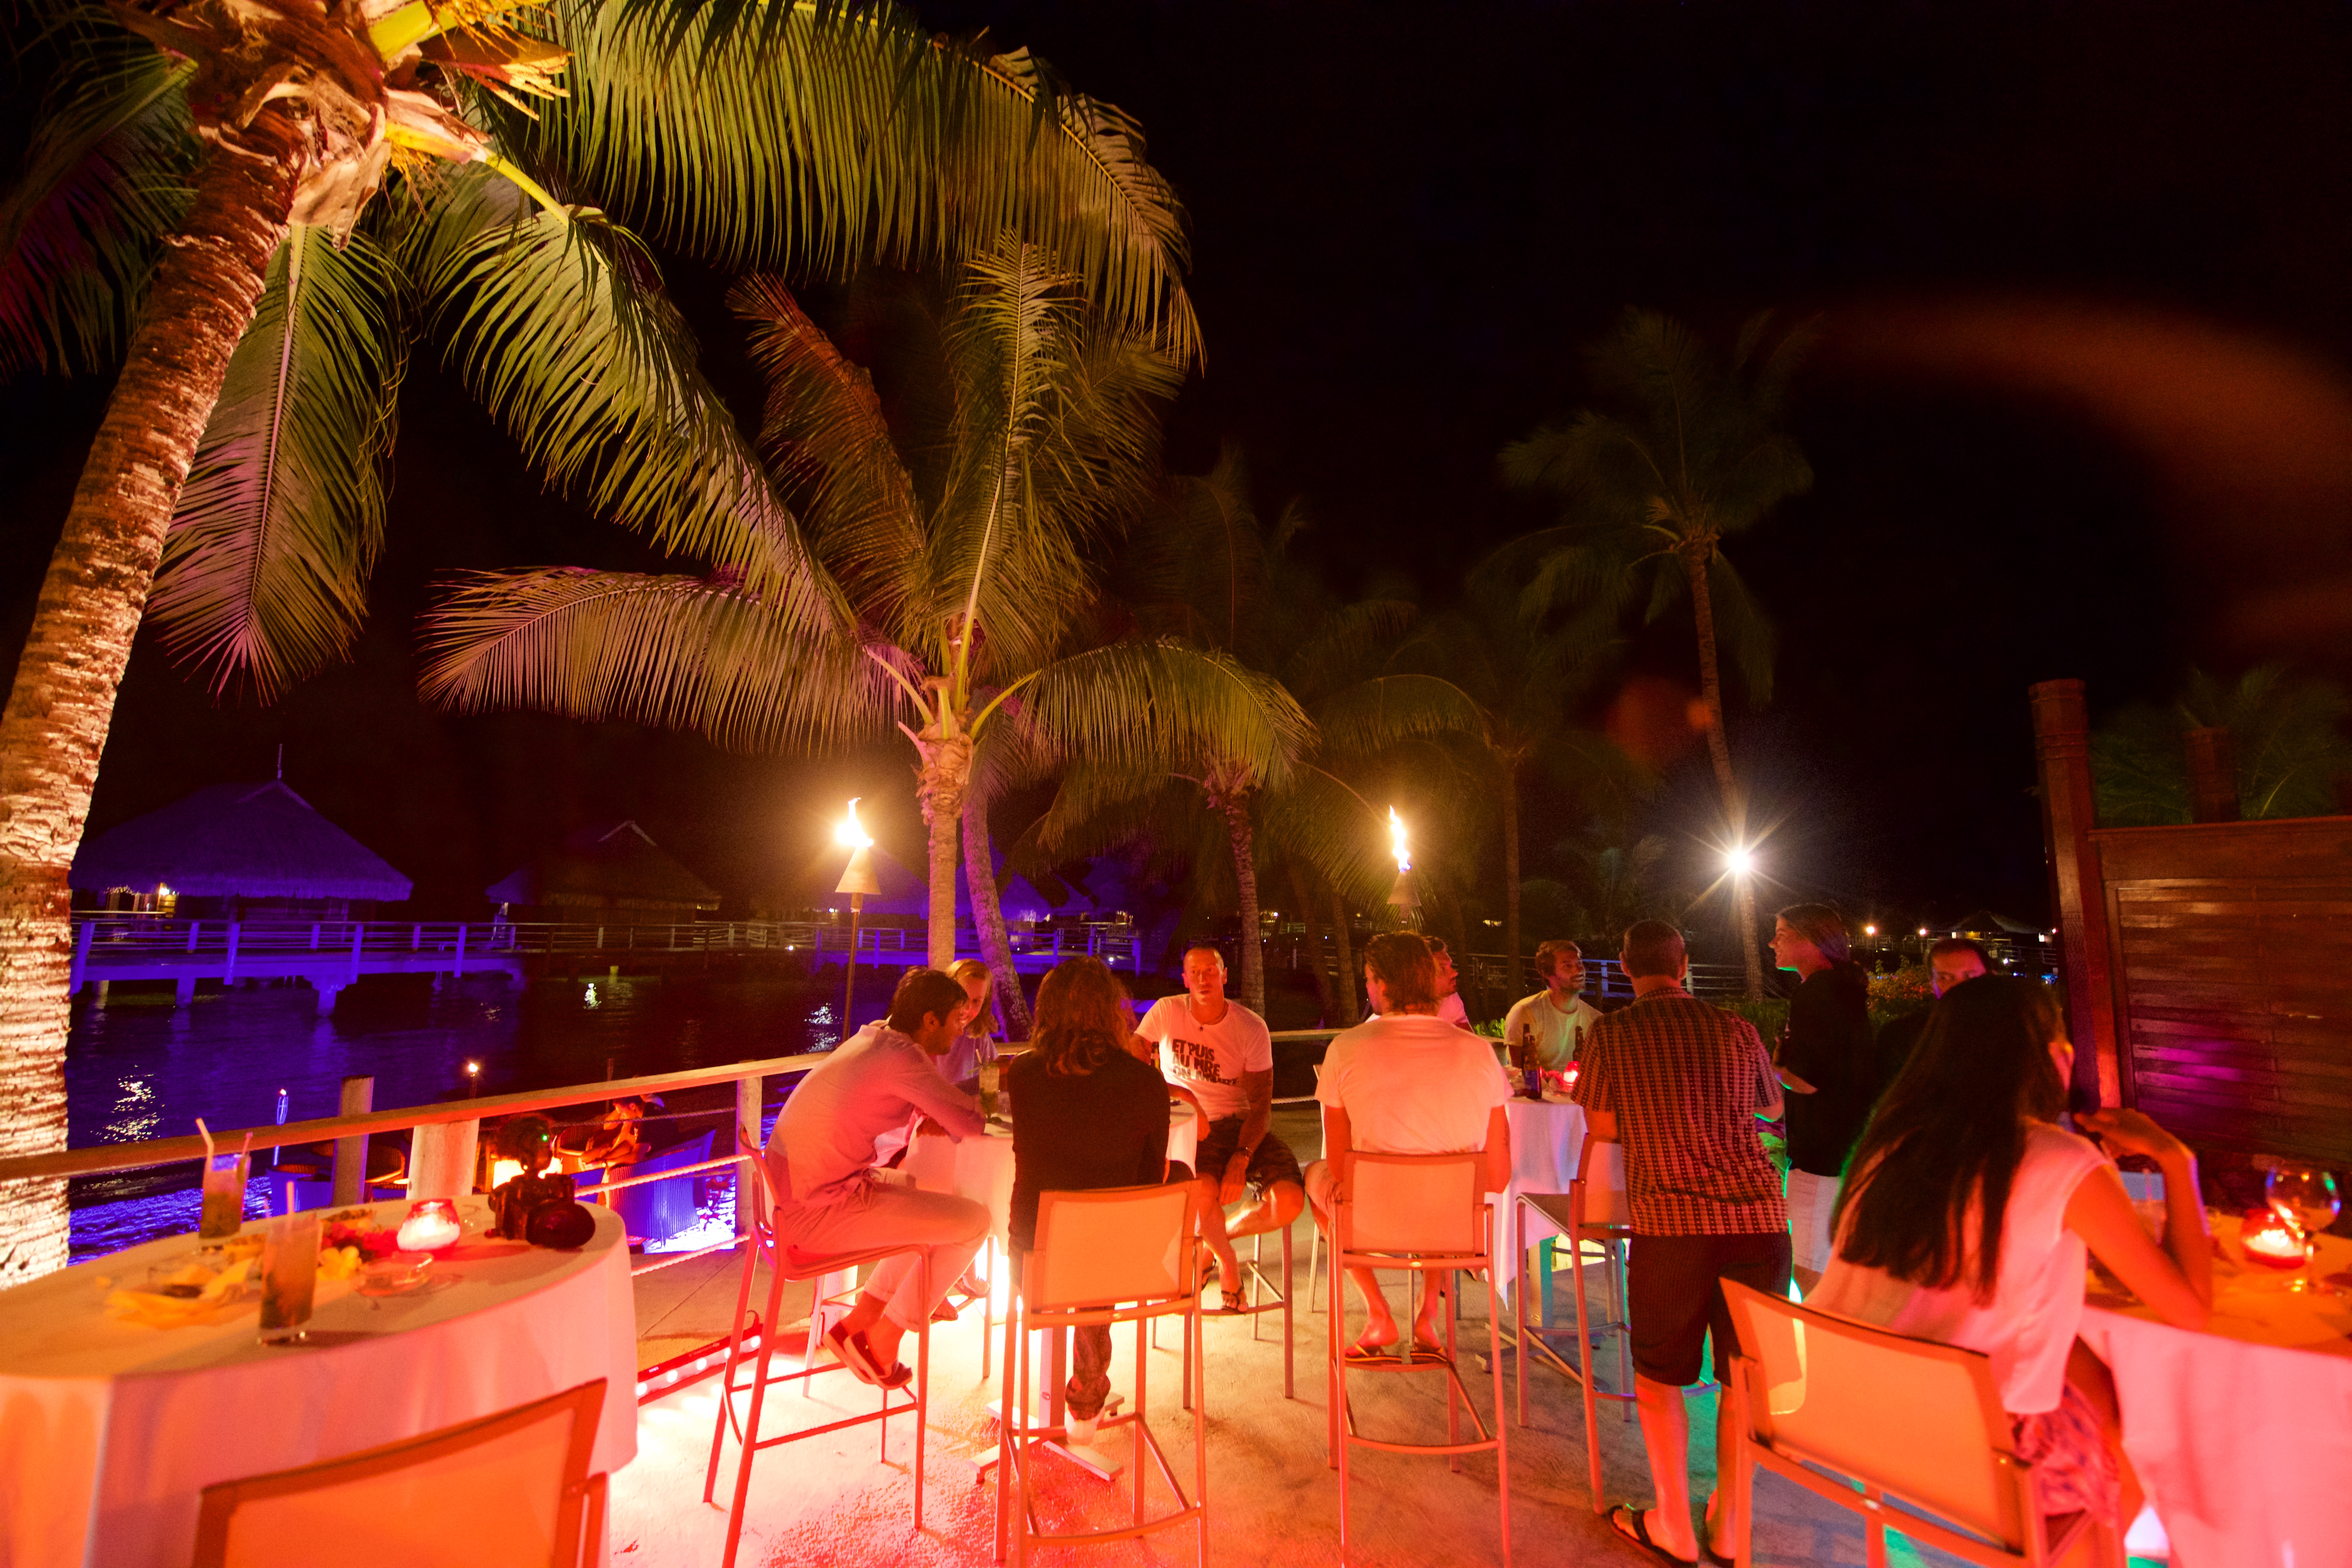 https://tahititourisme.fr/wp-content/uploads/2018/03/RESTAURATION-Matahiehani-Lounge-Bar-featured_image-Tim_McKenna.jpg